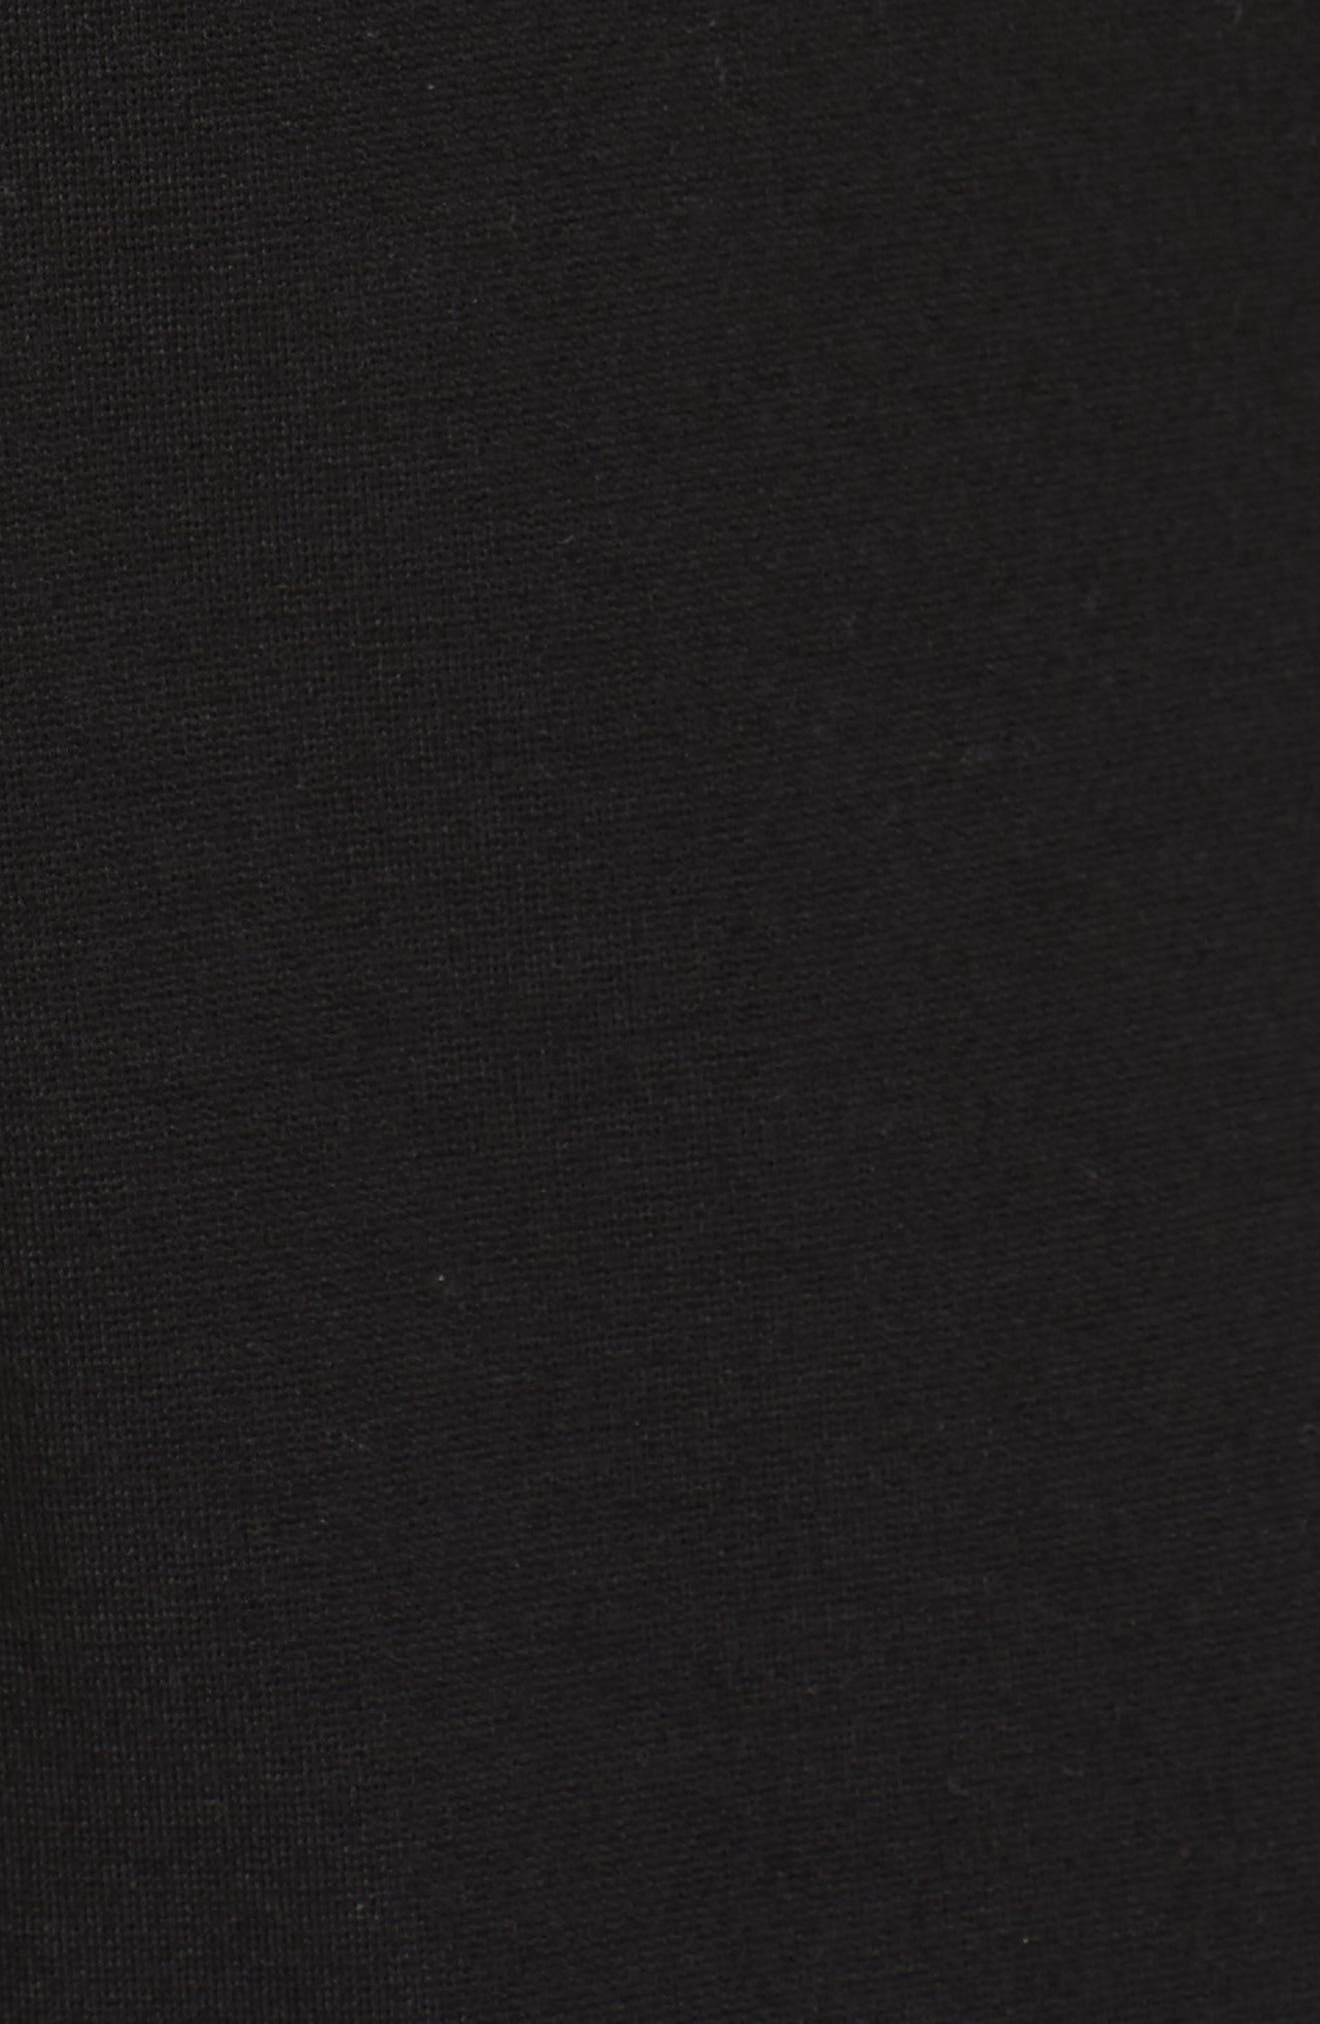 Lace Trim Sheath Dress,                             Alternate thumbnail 5, color,                             Black